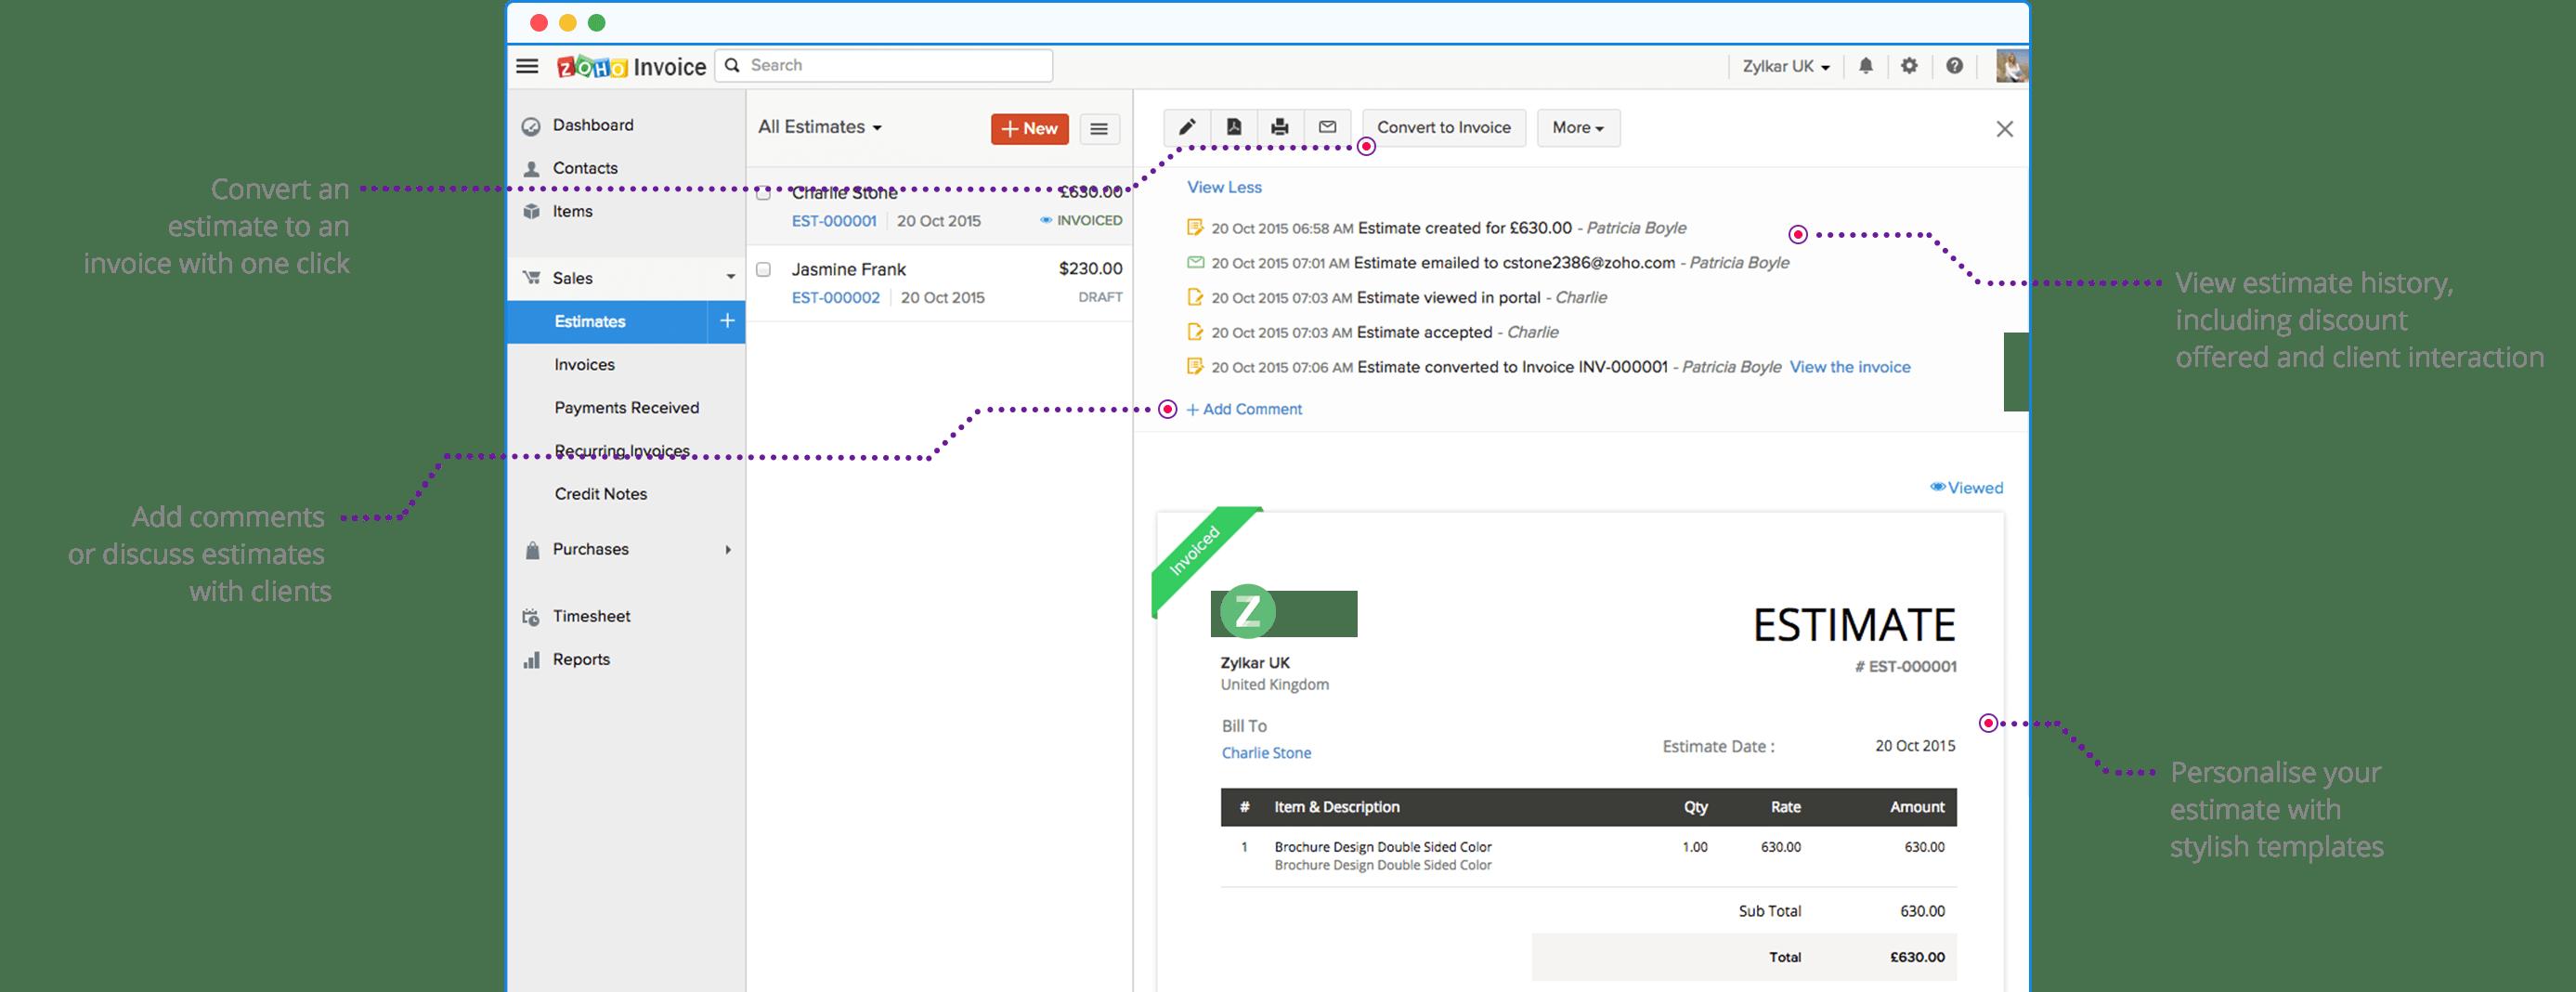 Create Professional Estimates with Ease - Zoho Invoice